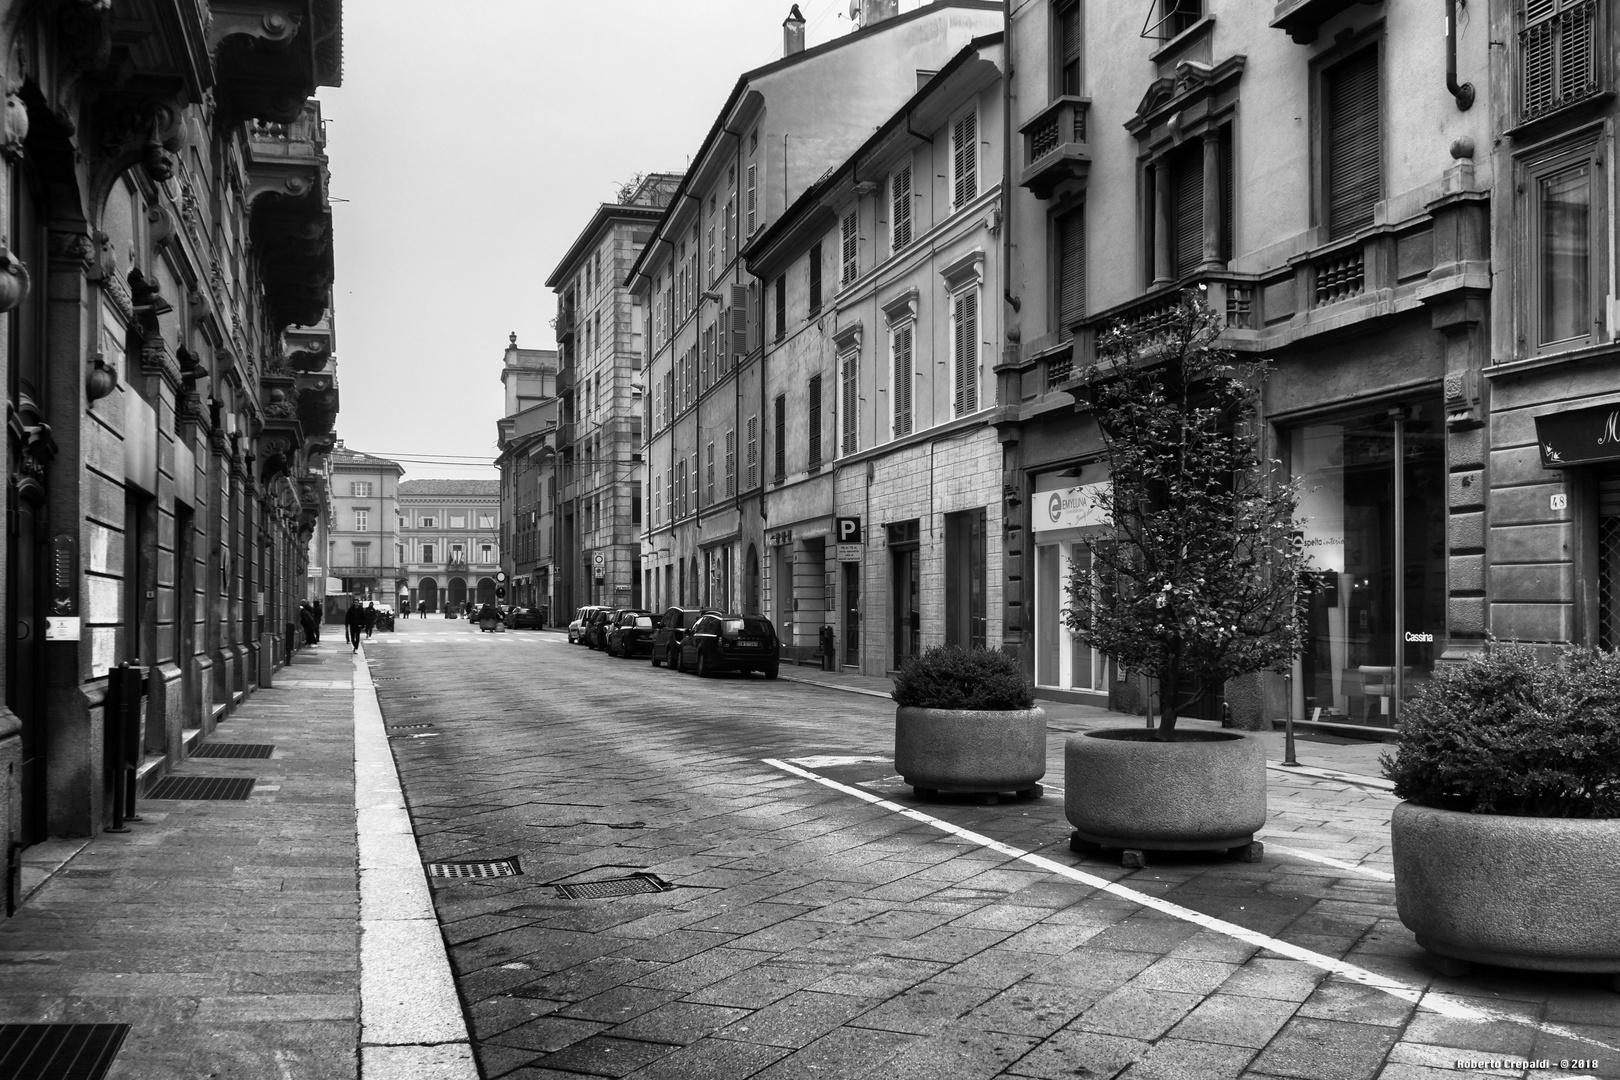 Via Cavour, Piacenza